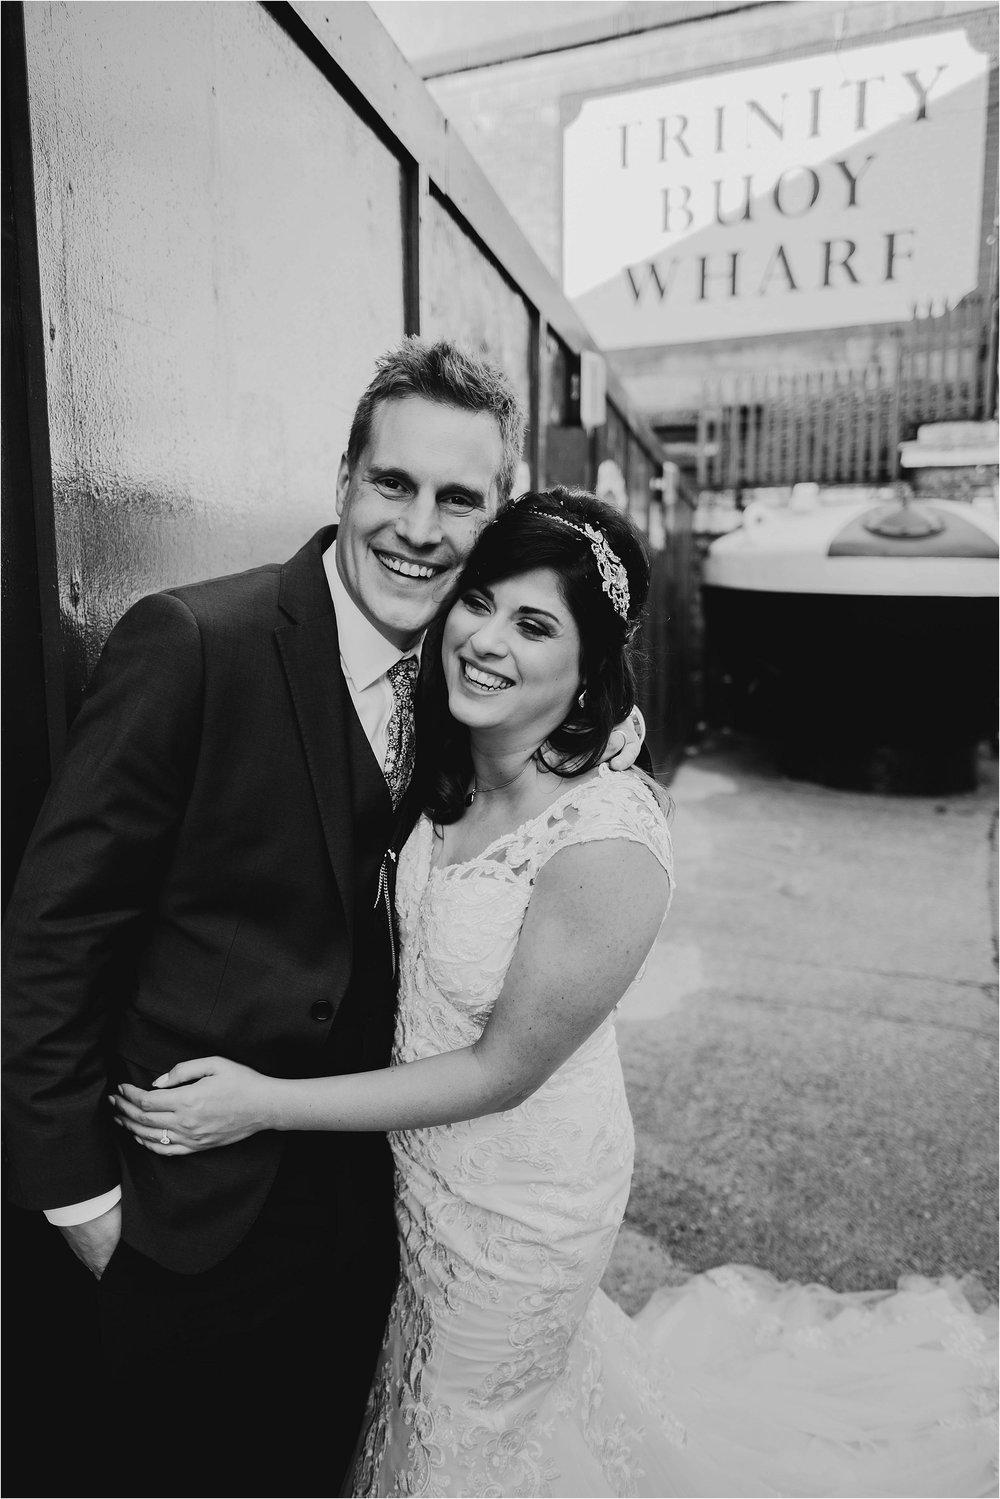 Trinity Buoy Wharf Wedding Photography_0079.jpg